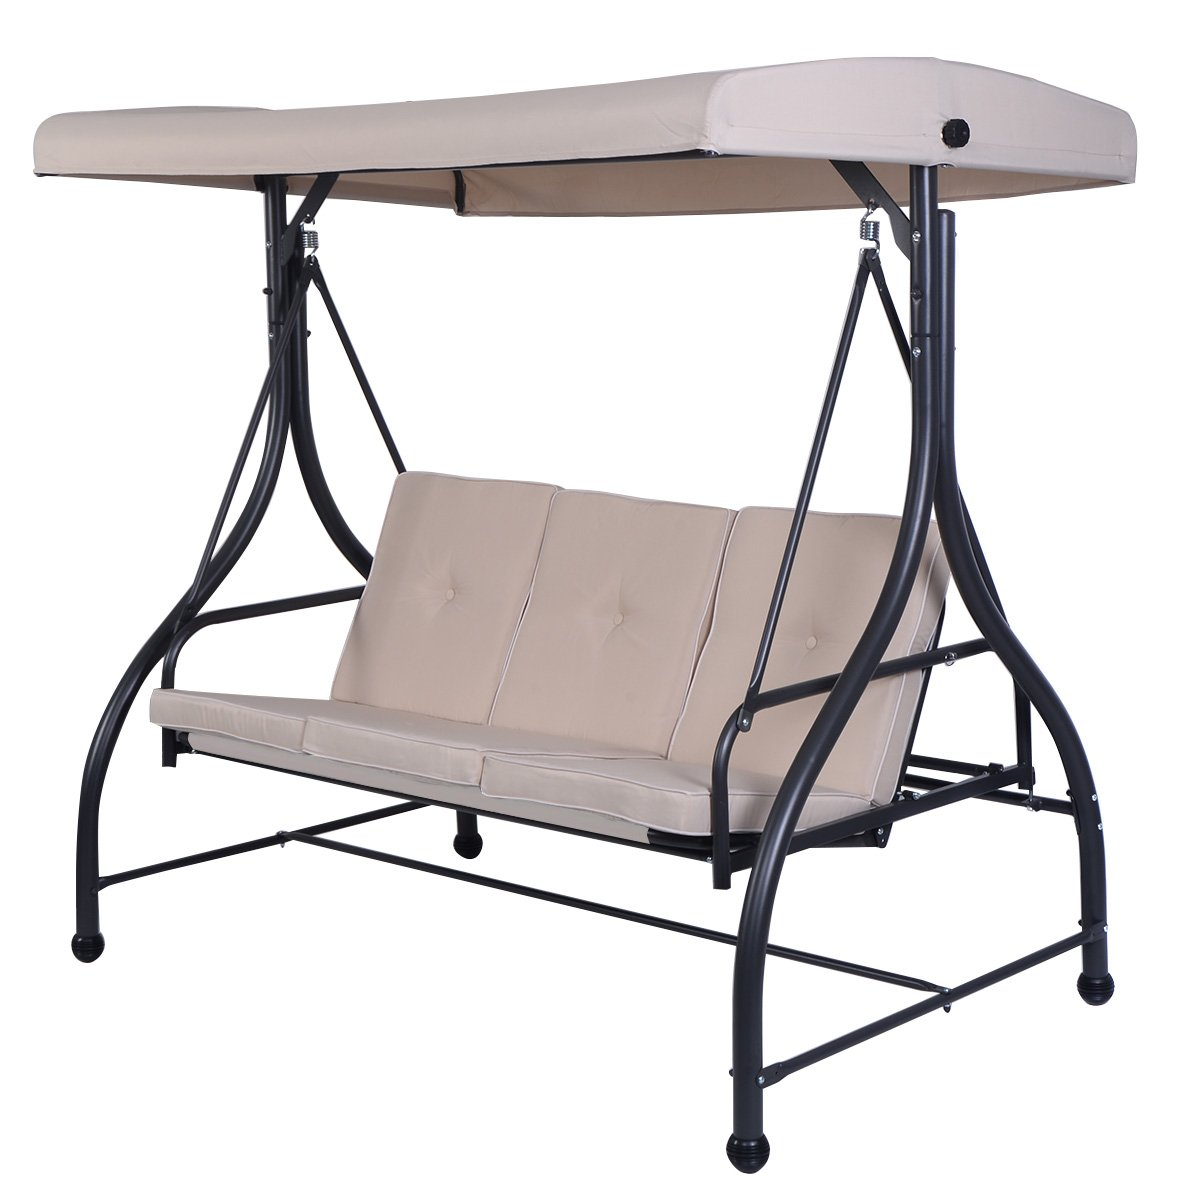 Tangkula Converting Outdoor Swing Canopy Hammock 3 Seats Patio Deck Furniture (Beige)